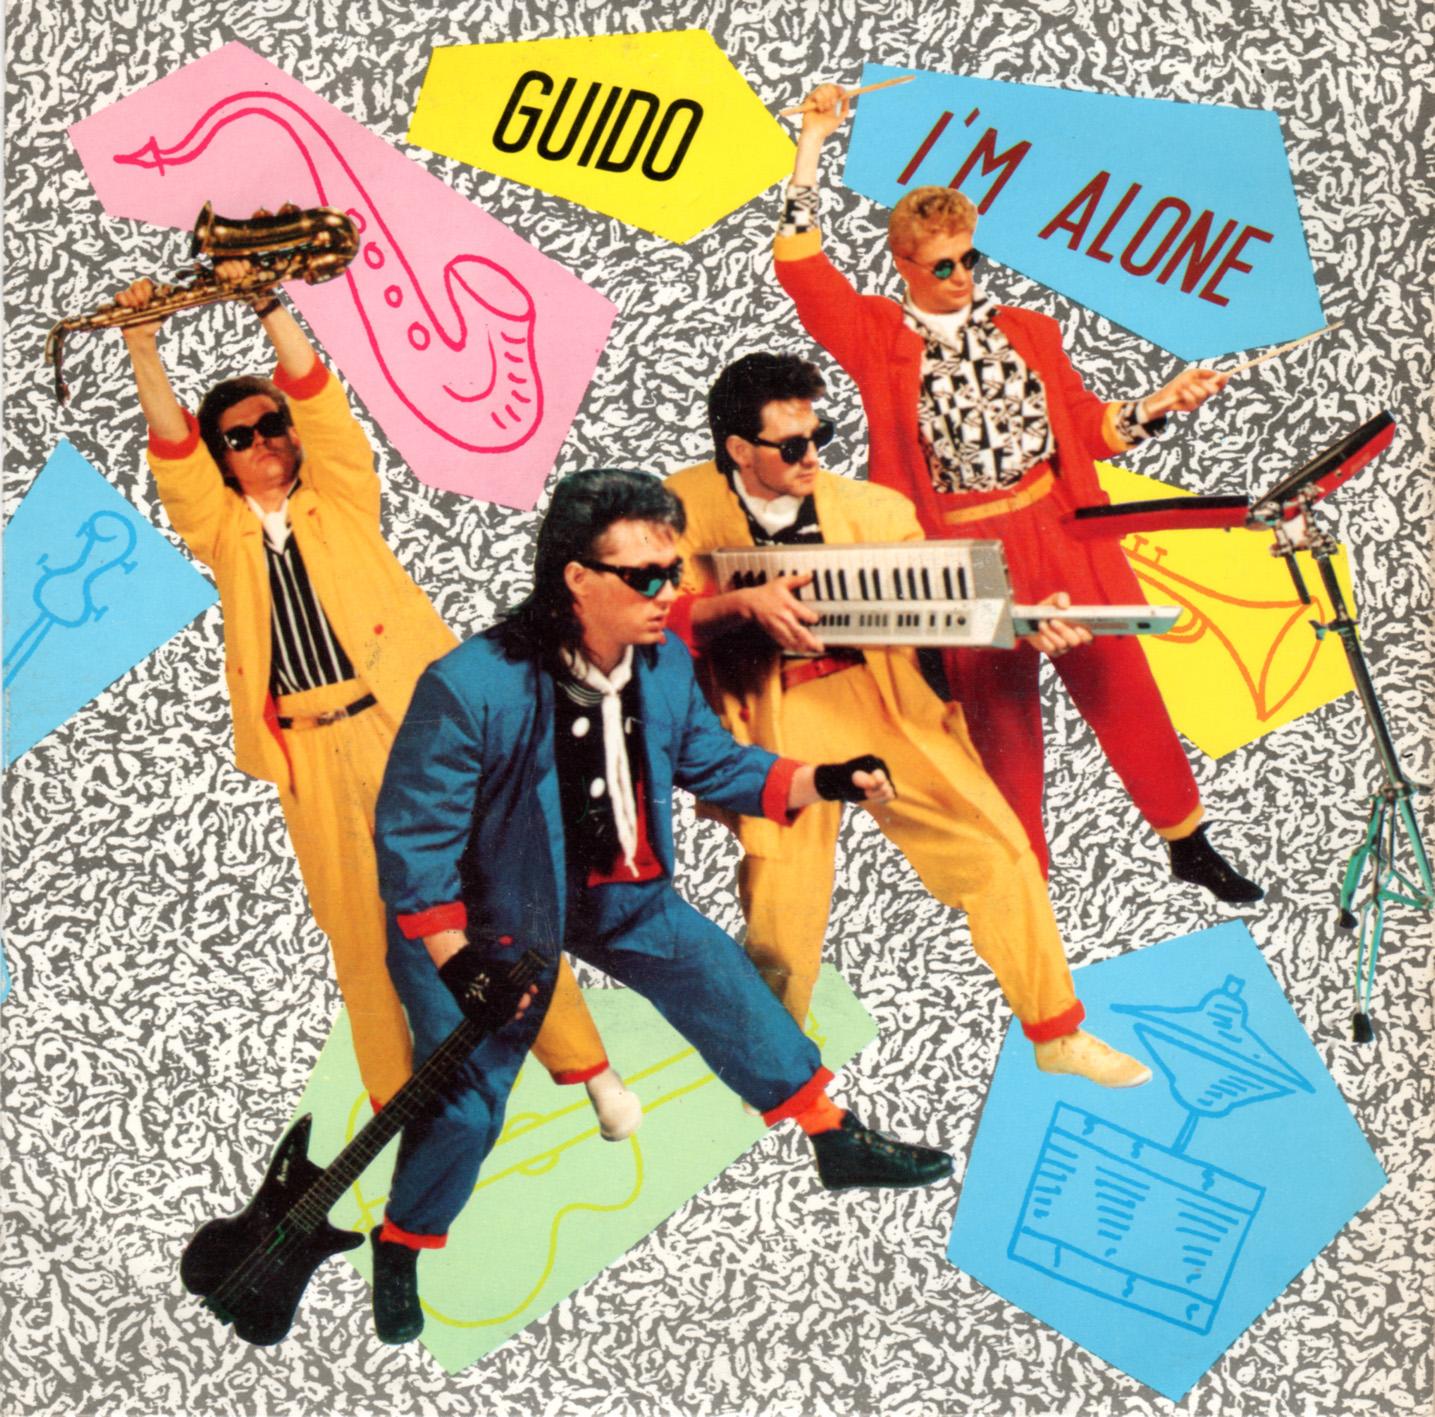 Guido - I'm Alone